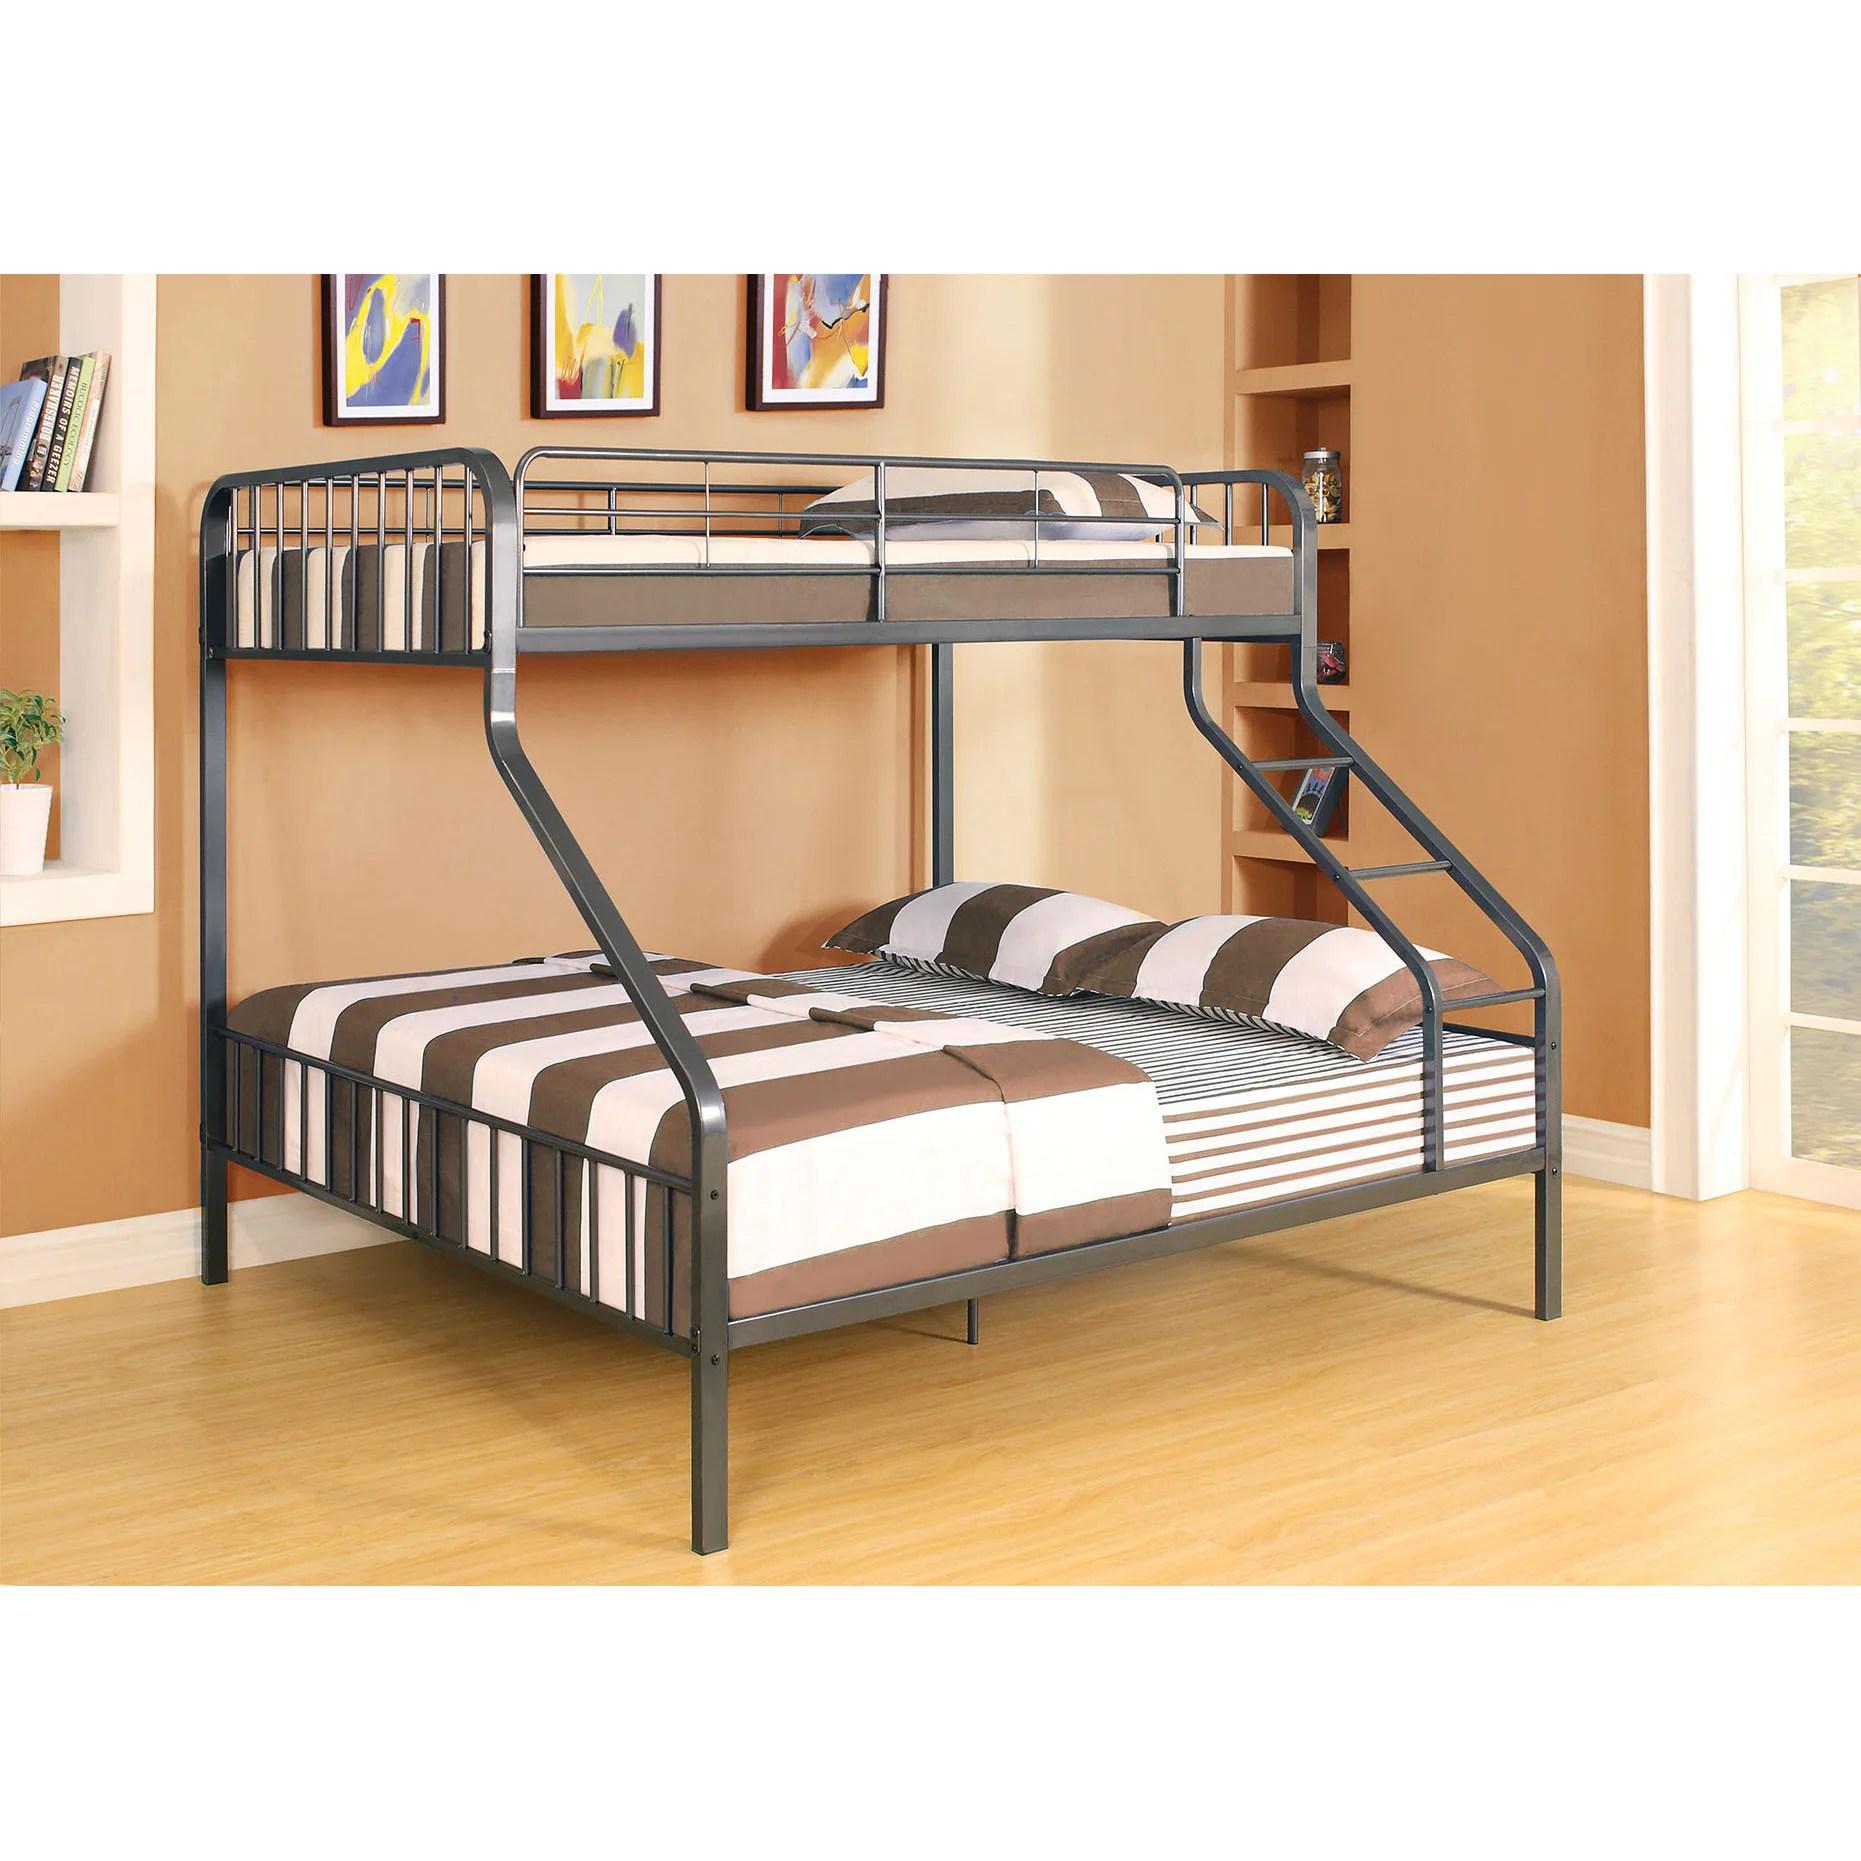 Caius Gunmetal Twin Xl Queen Bunk Bed On Sale Overstock 12033438